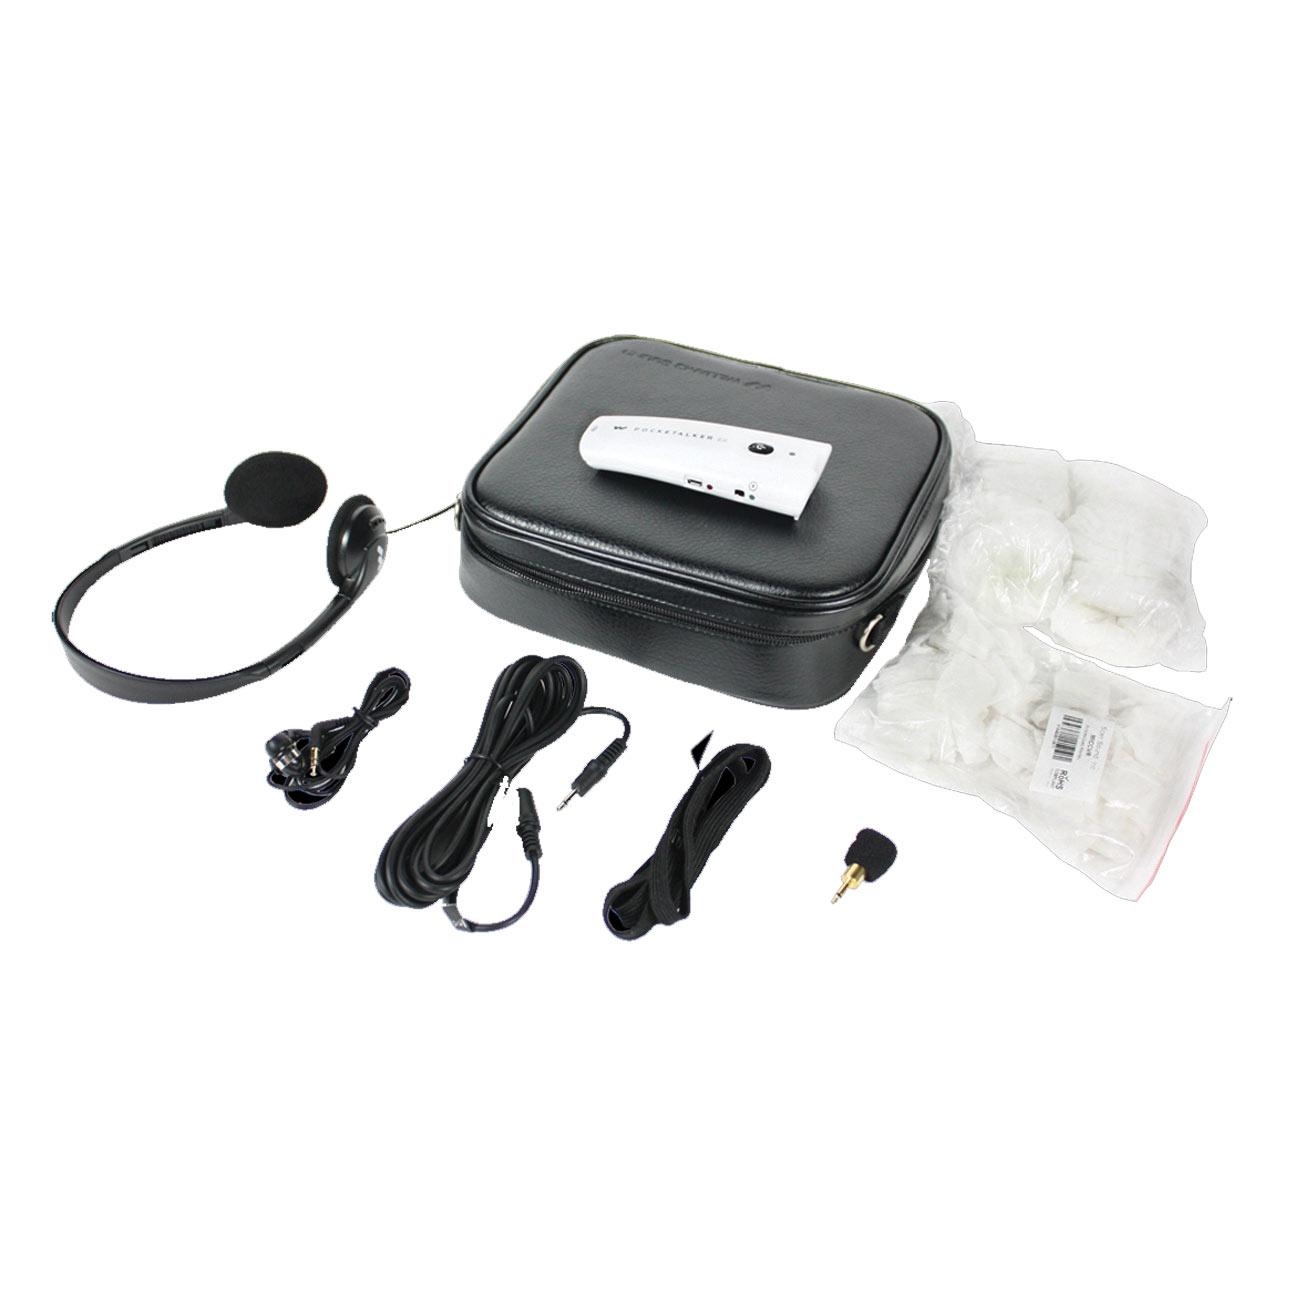 Pocketalker Basic Communication Kit 2.0 System